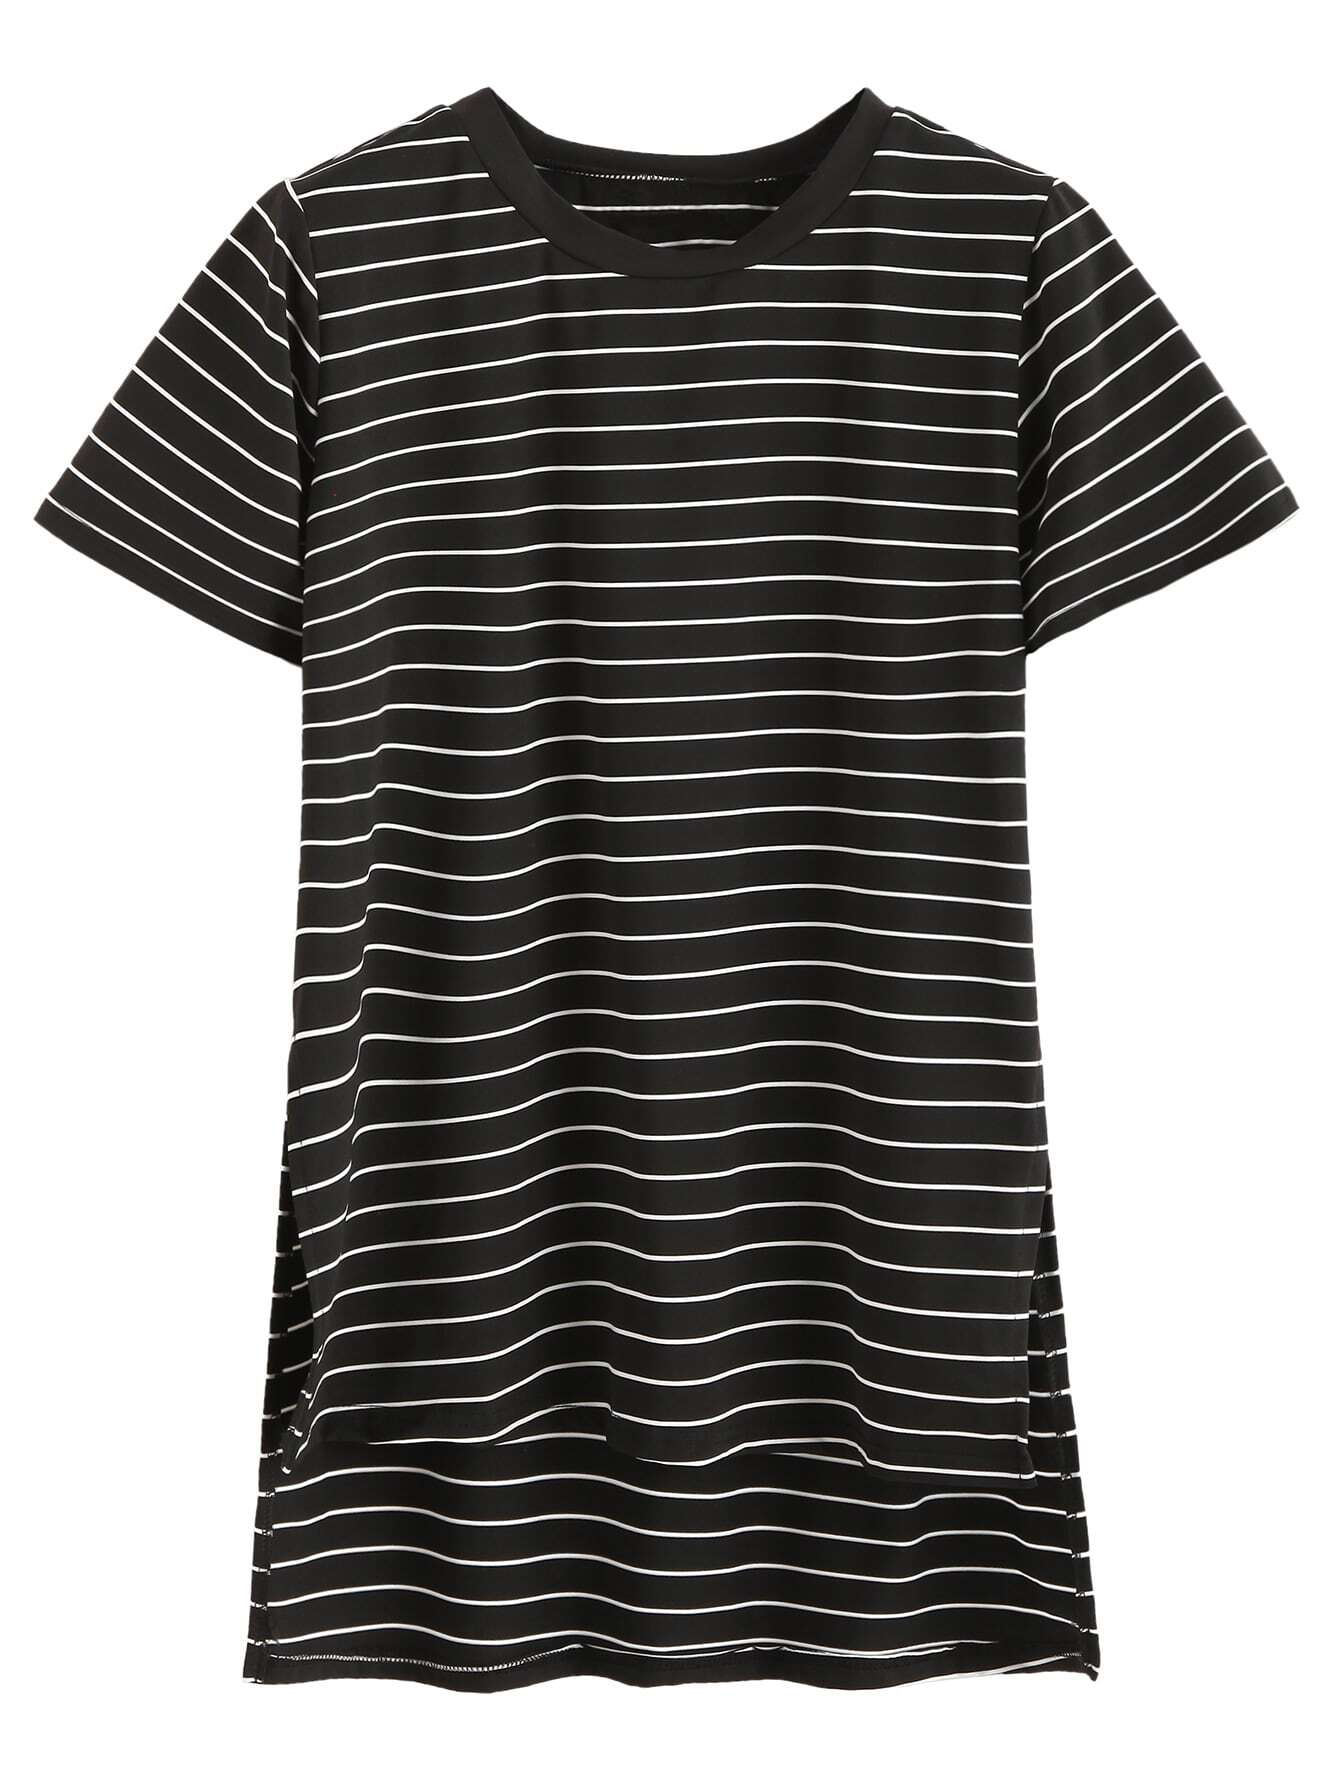 Black Striped Slit Side High Low T-shirt tee160901101